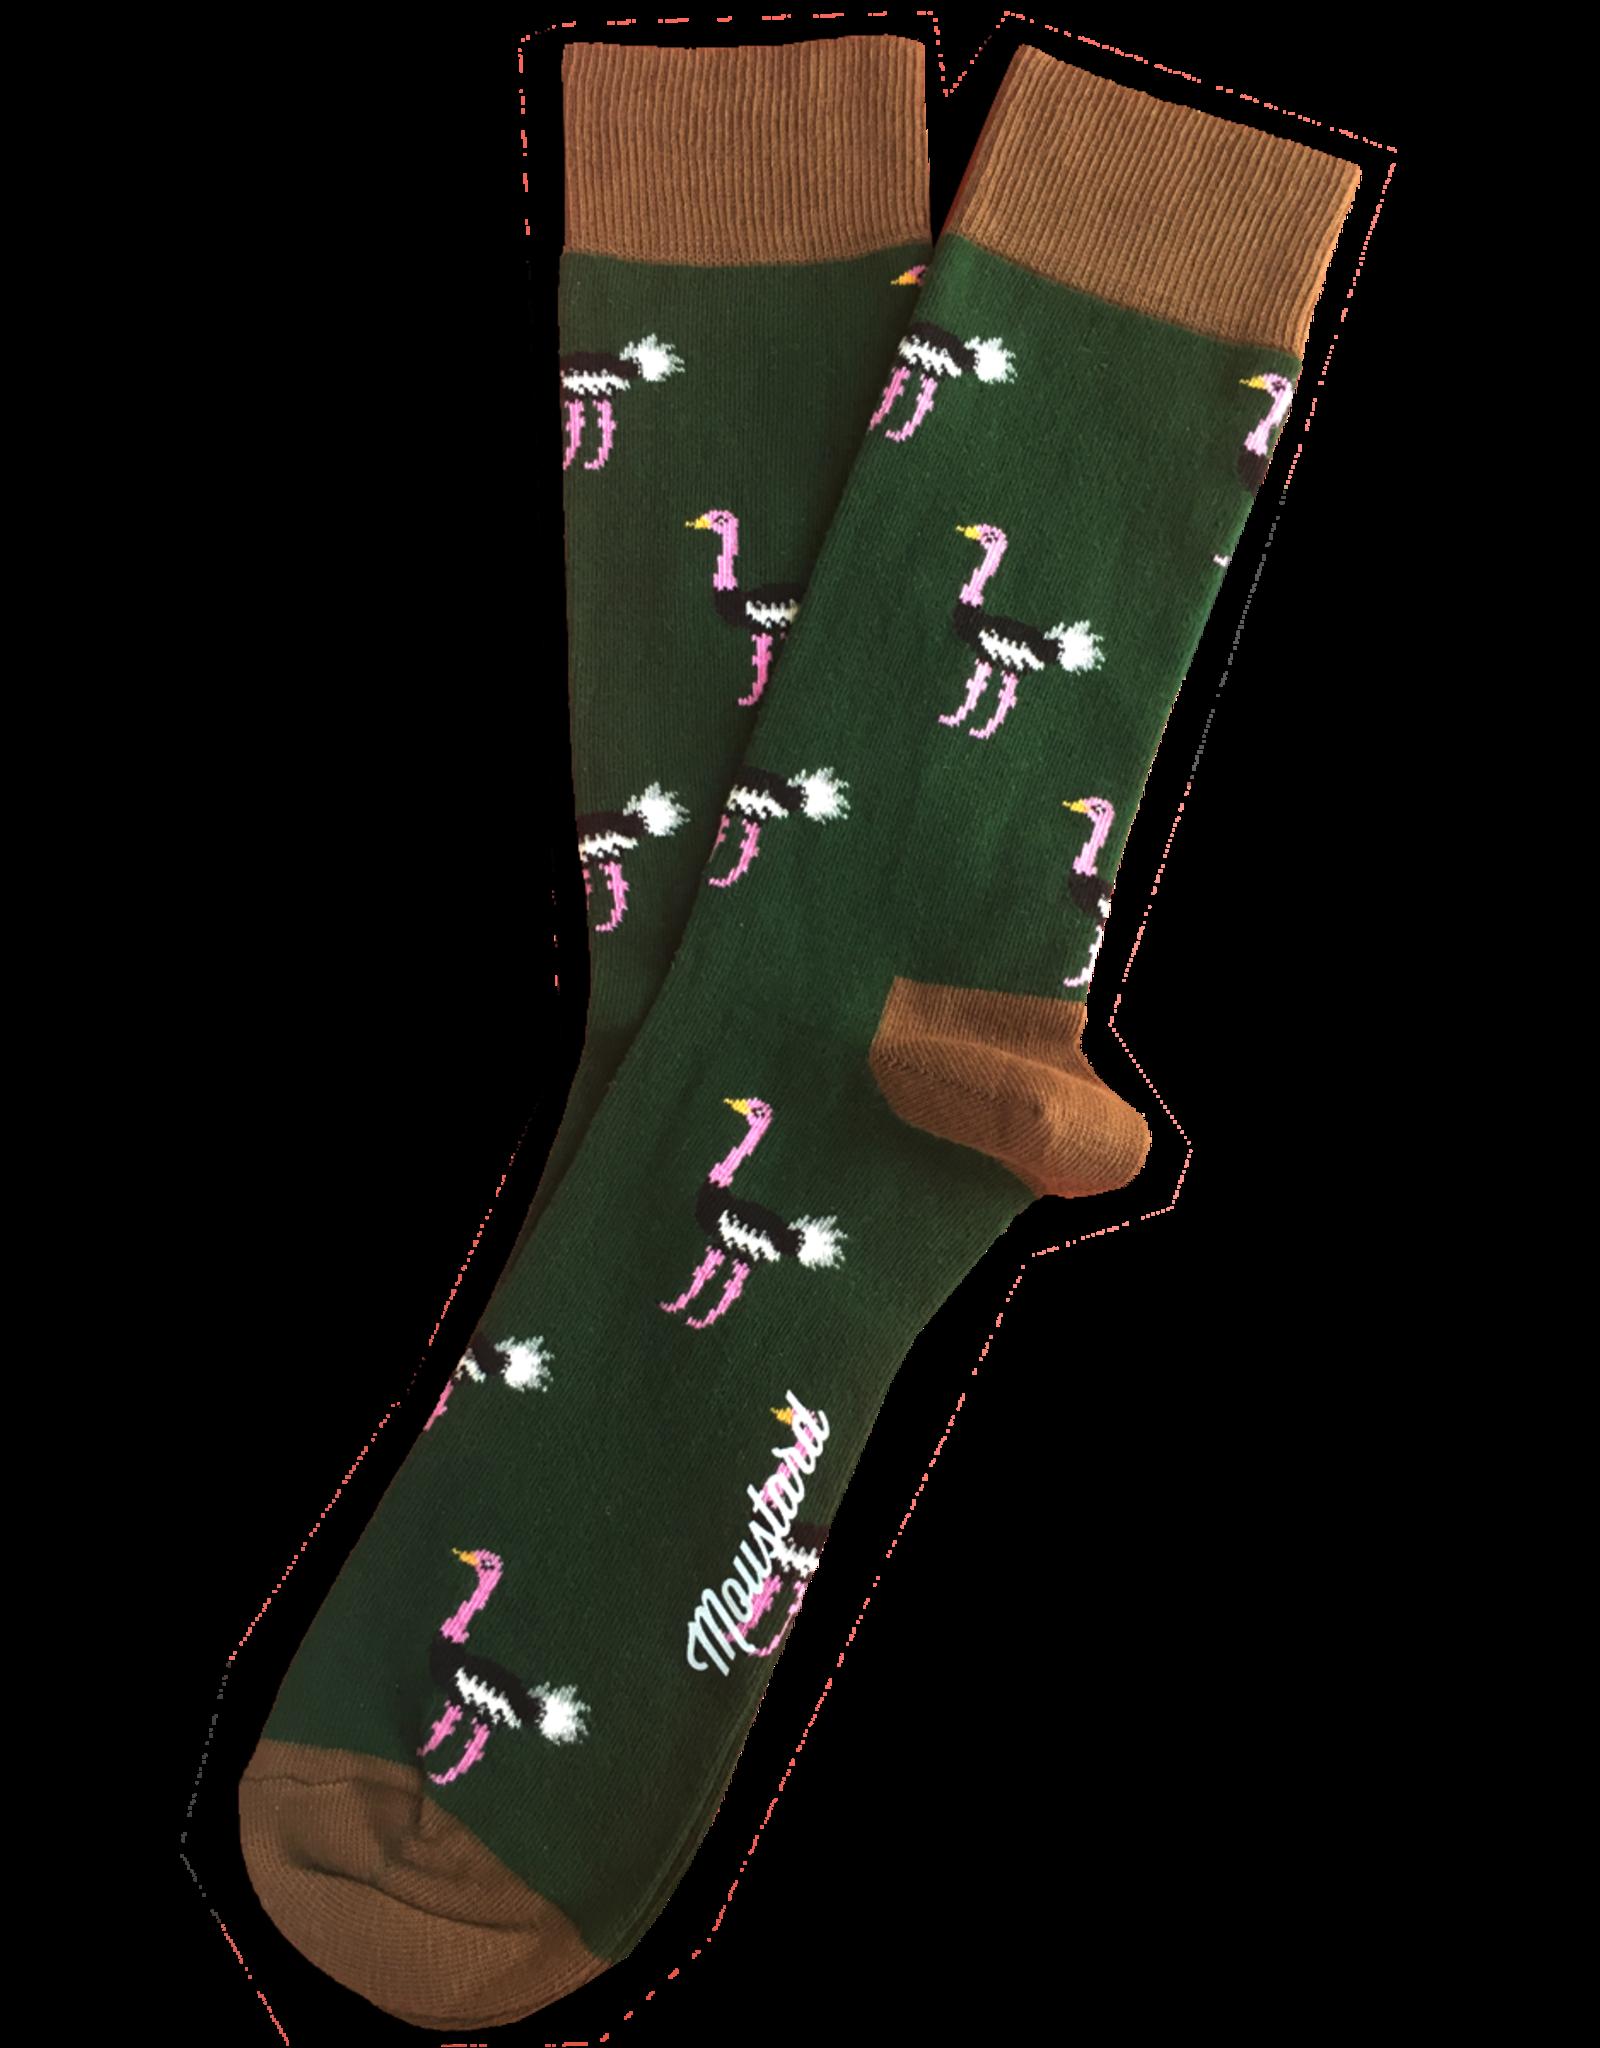 Moustard socks - ostrichs (36-40)